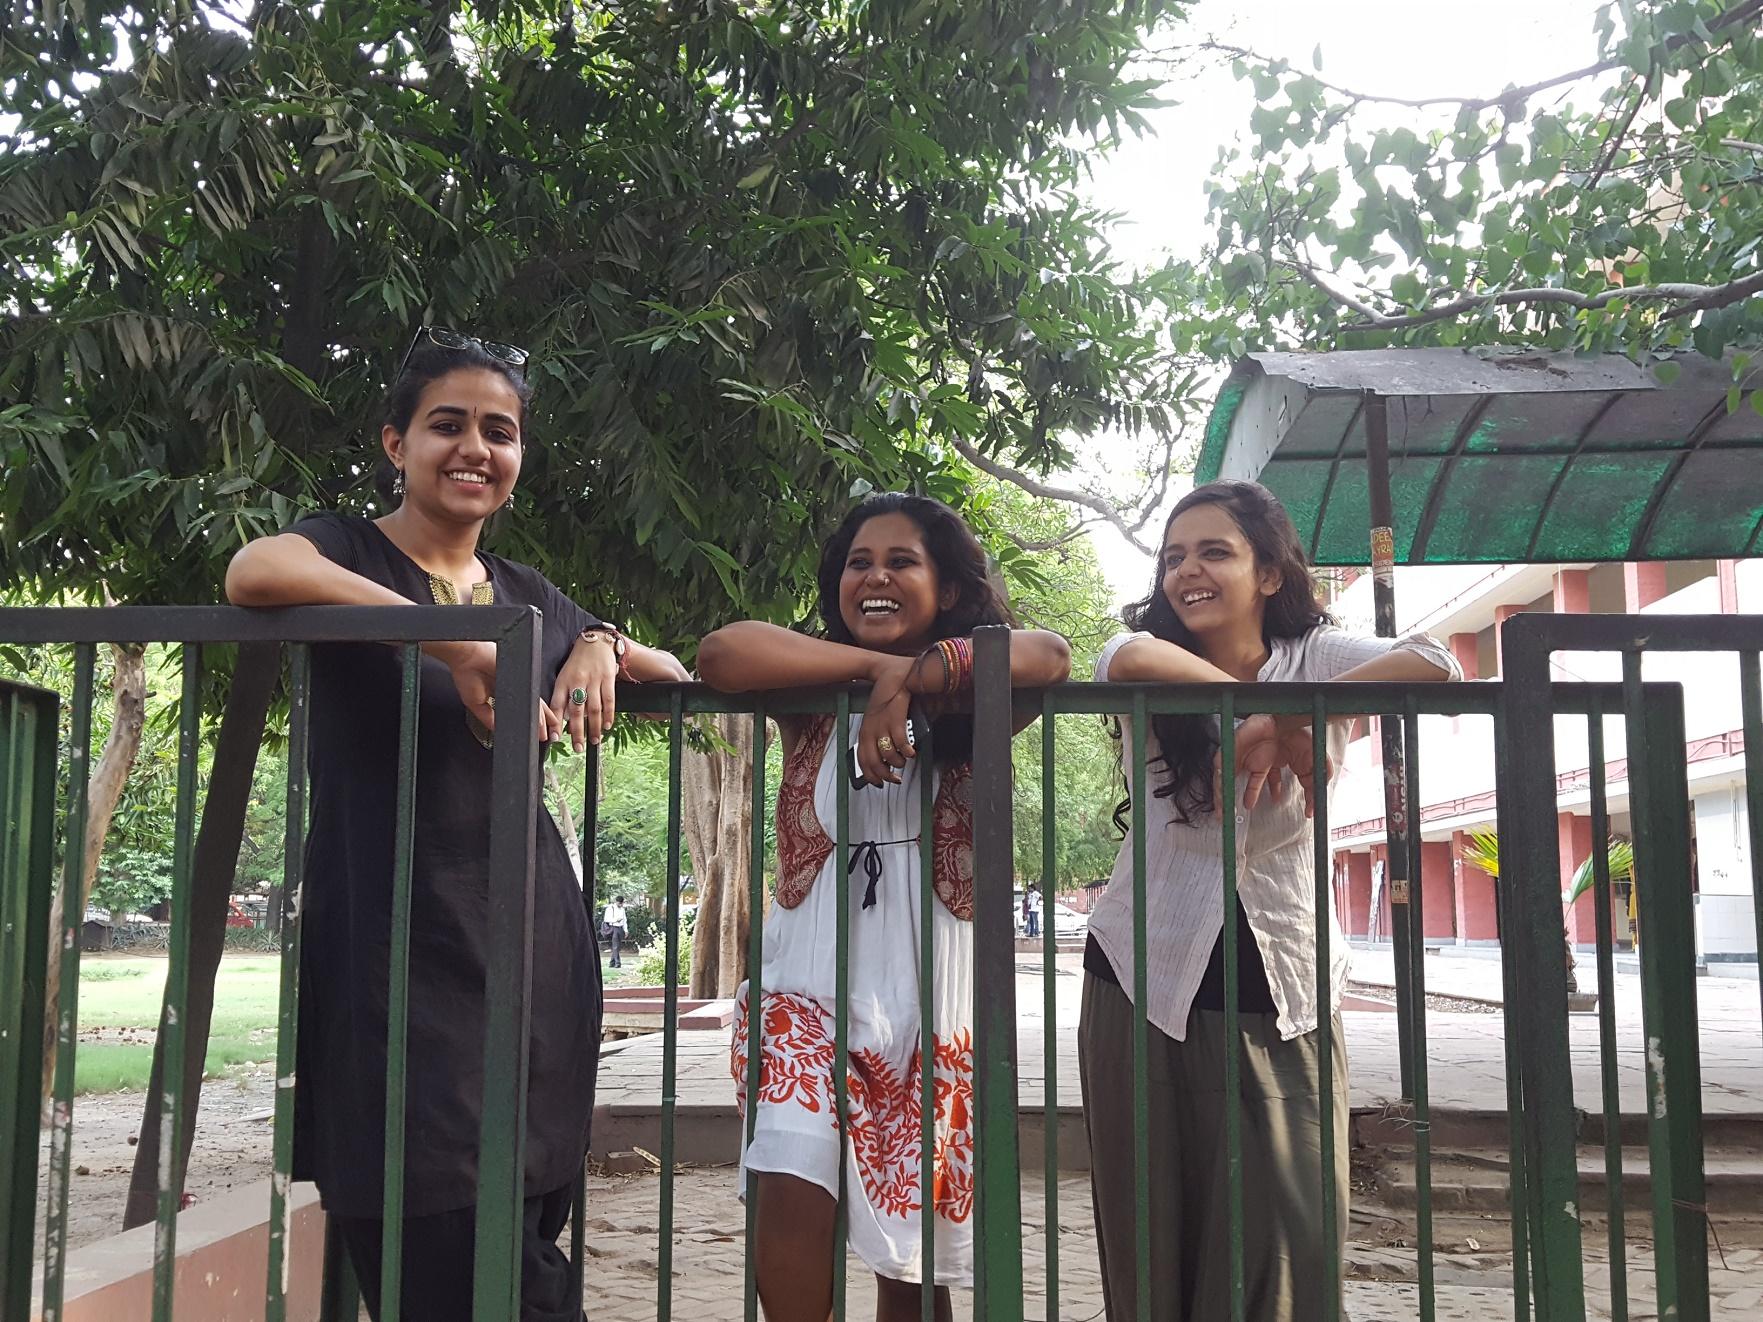 Líderes do Pinjra Tod (Devika, Devangana e Shambhavi) no campus da Universidade de Delhi